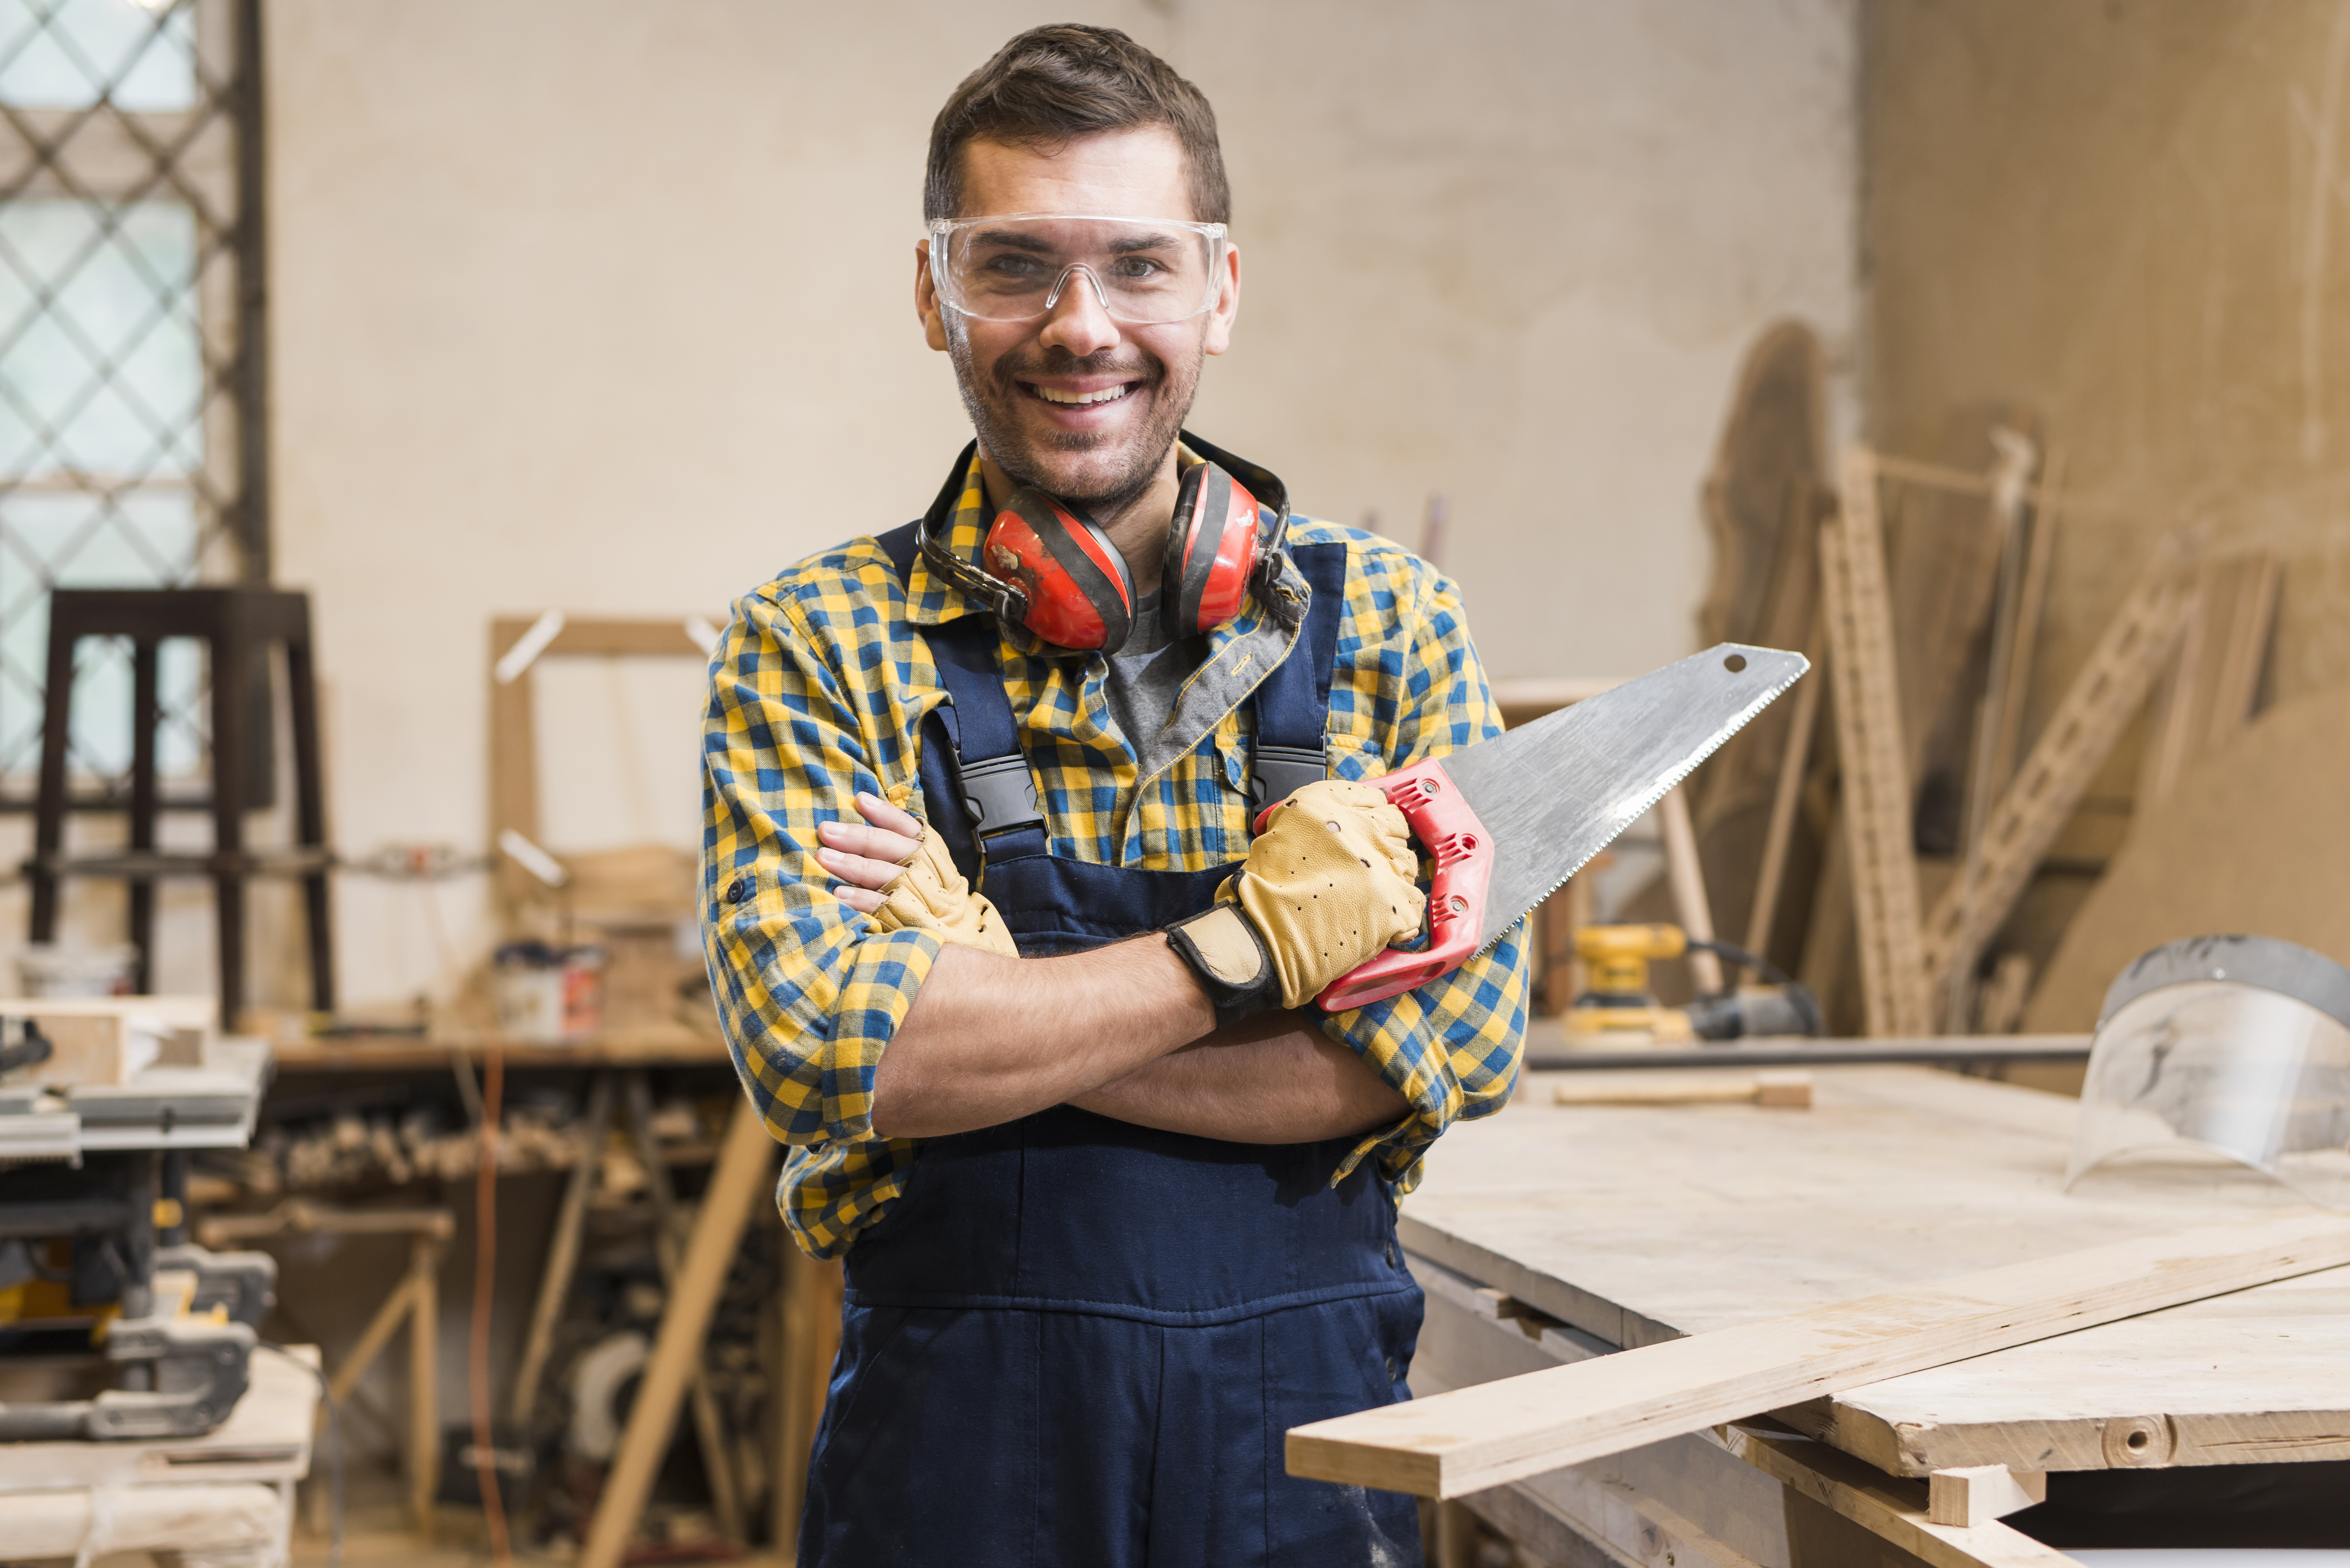 Comment bien choisir son artisan ?